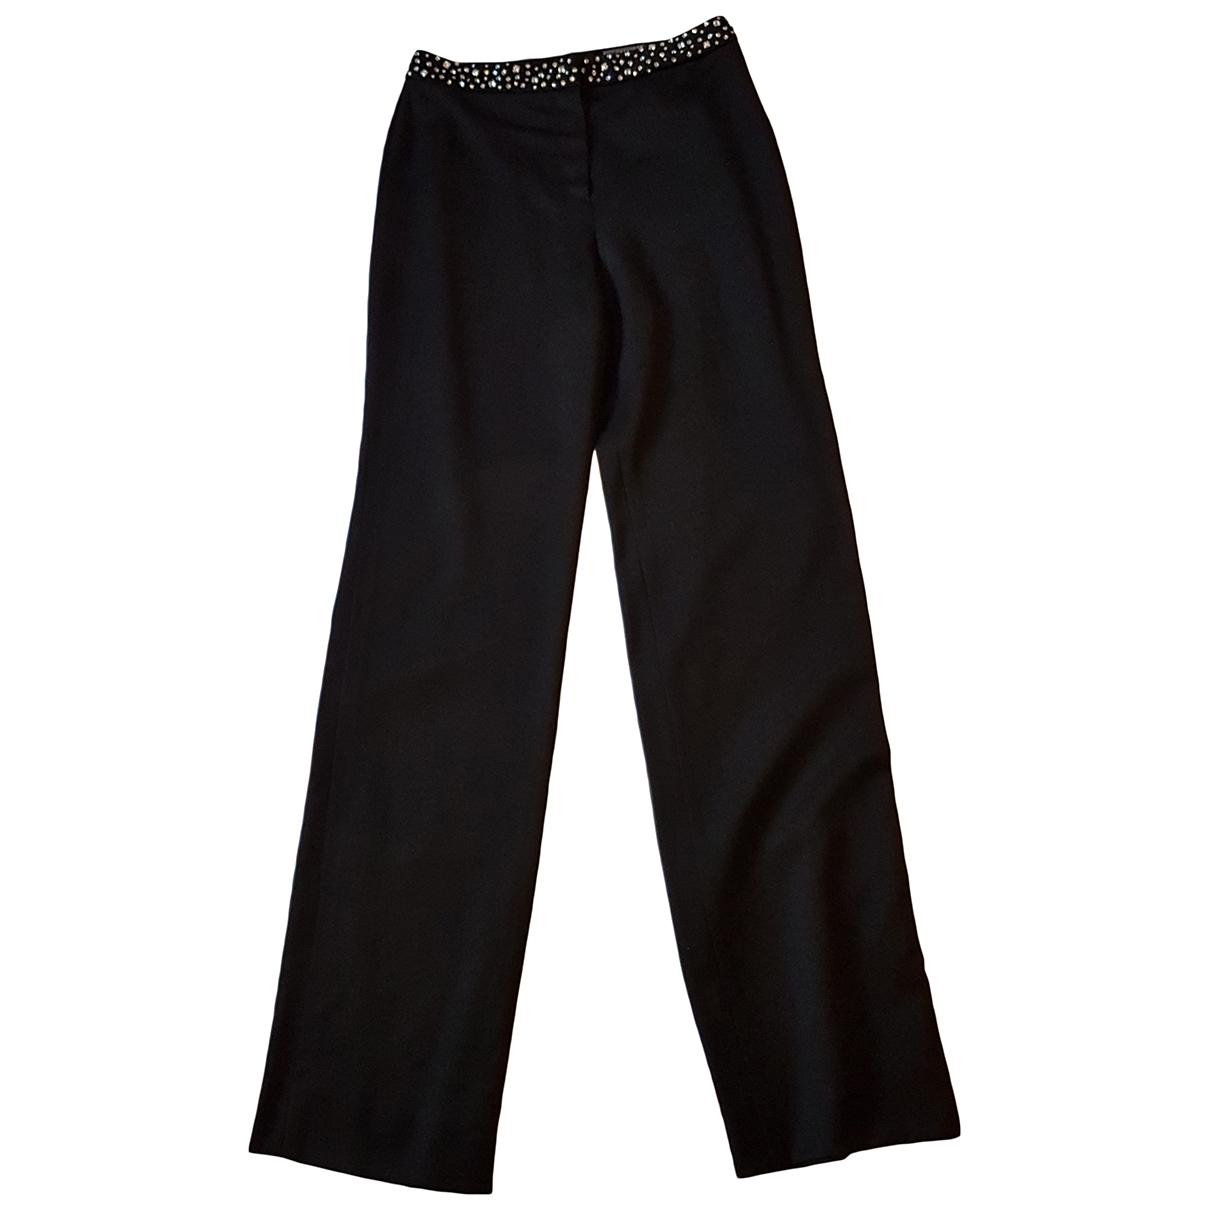 Gianni Versace \N Black Wool Trousers for Women 40 IT